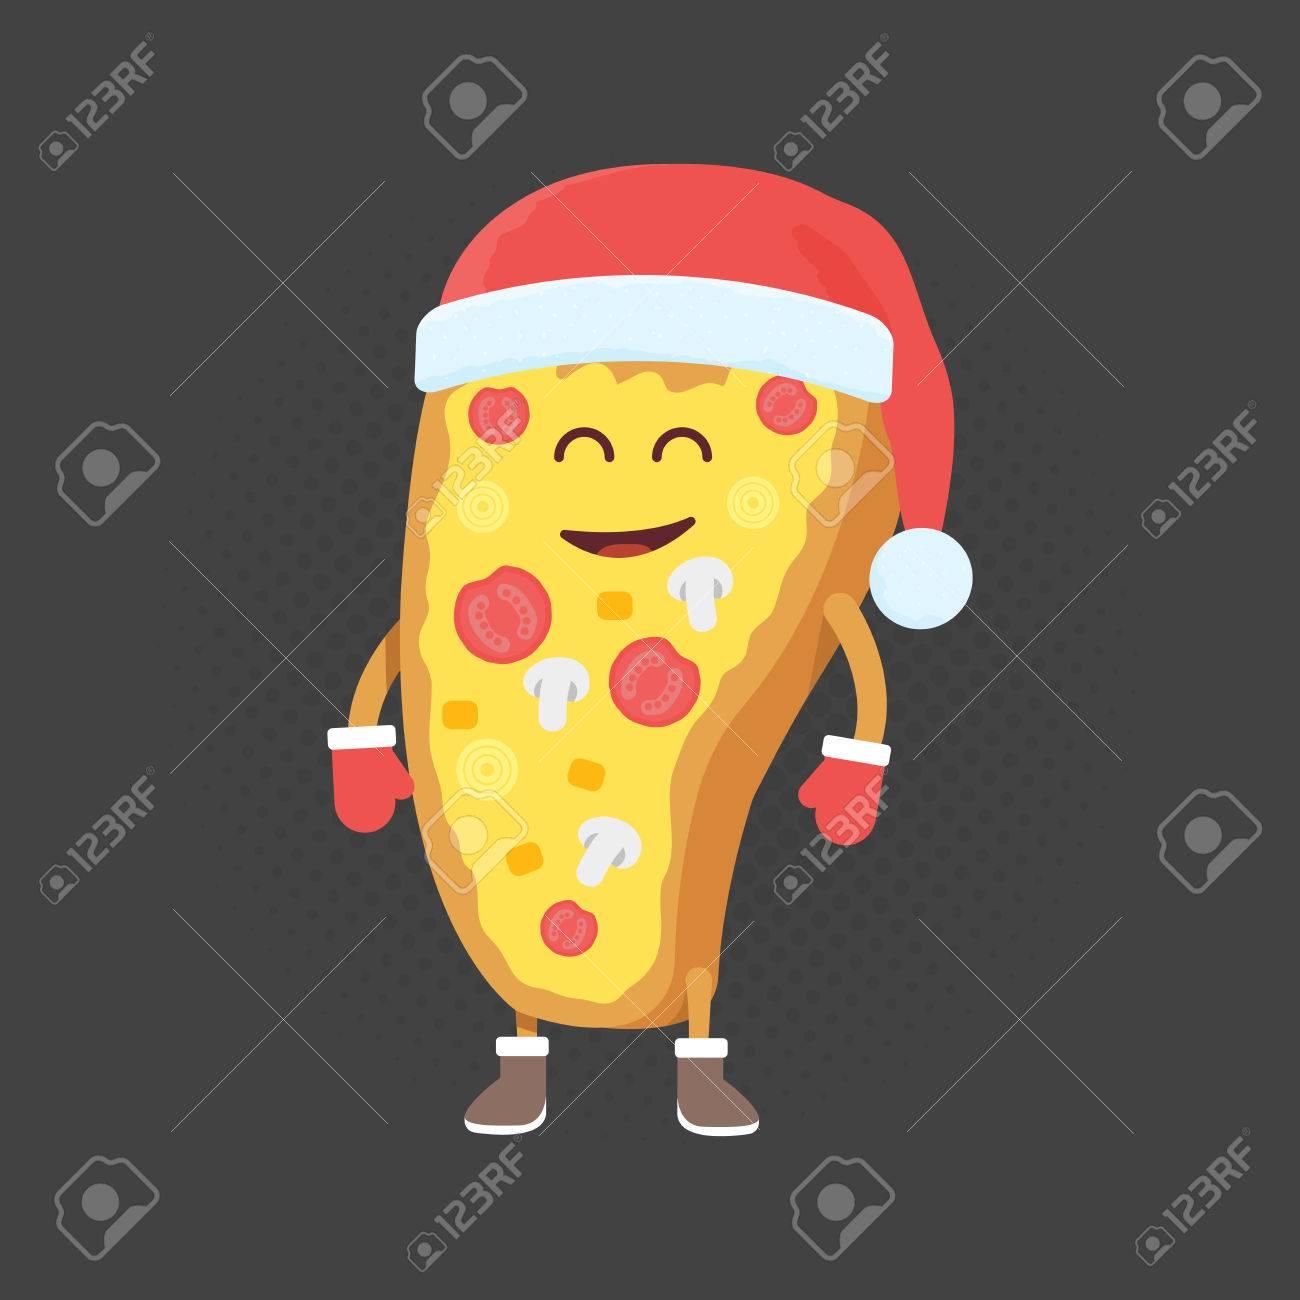 Kids Restaurant Menu Cardboard Character Christmas And New Year